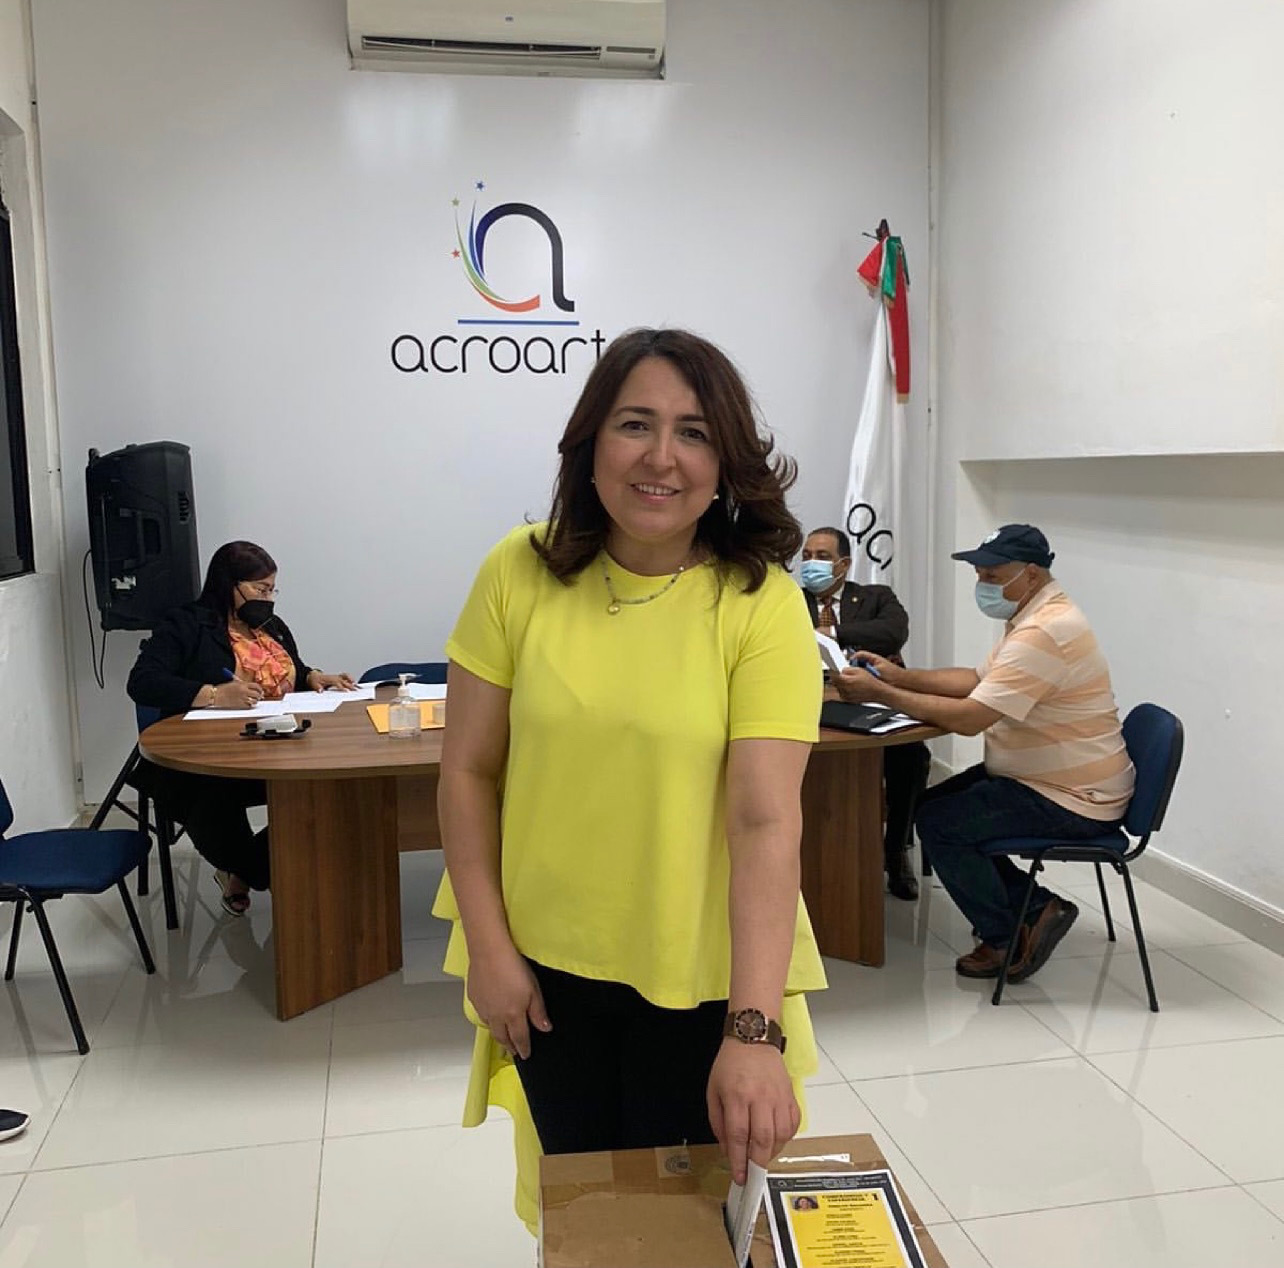 Emelyn Baldera es electa presidenta de Acroarte para período 2021-2023